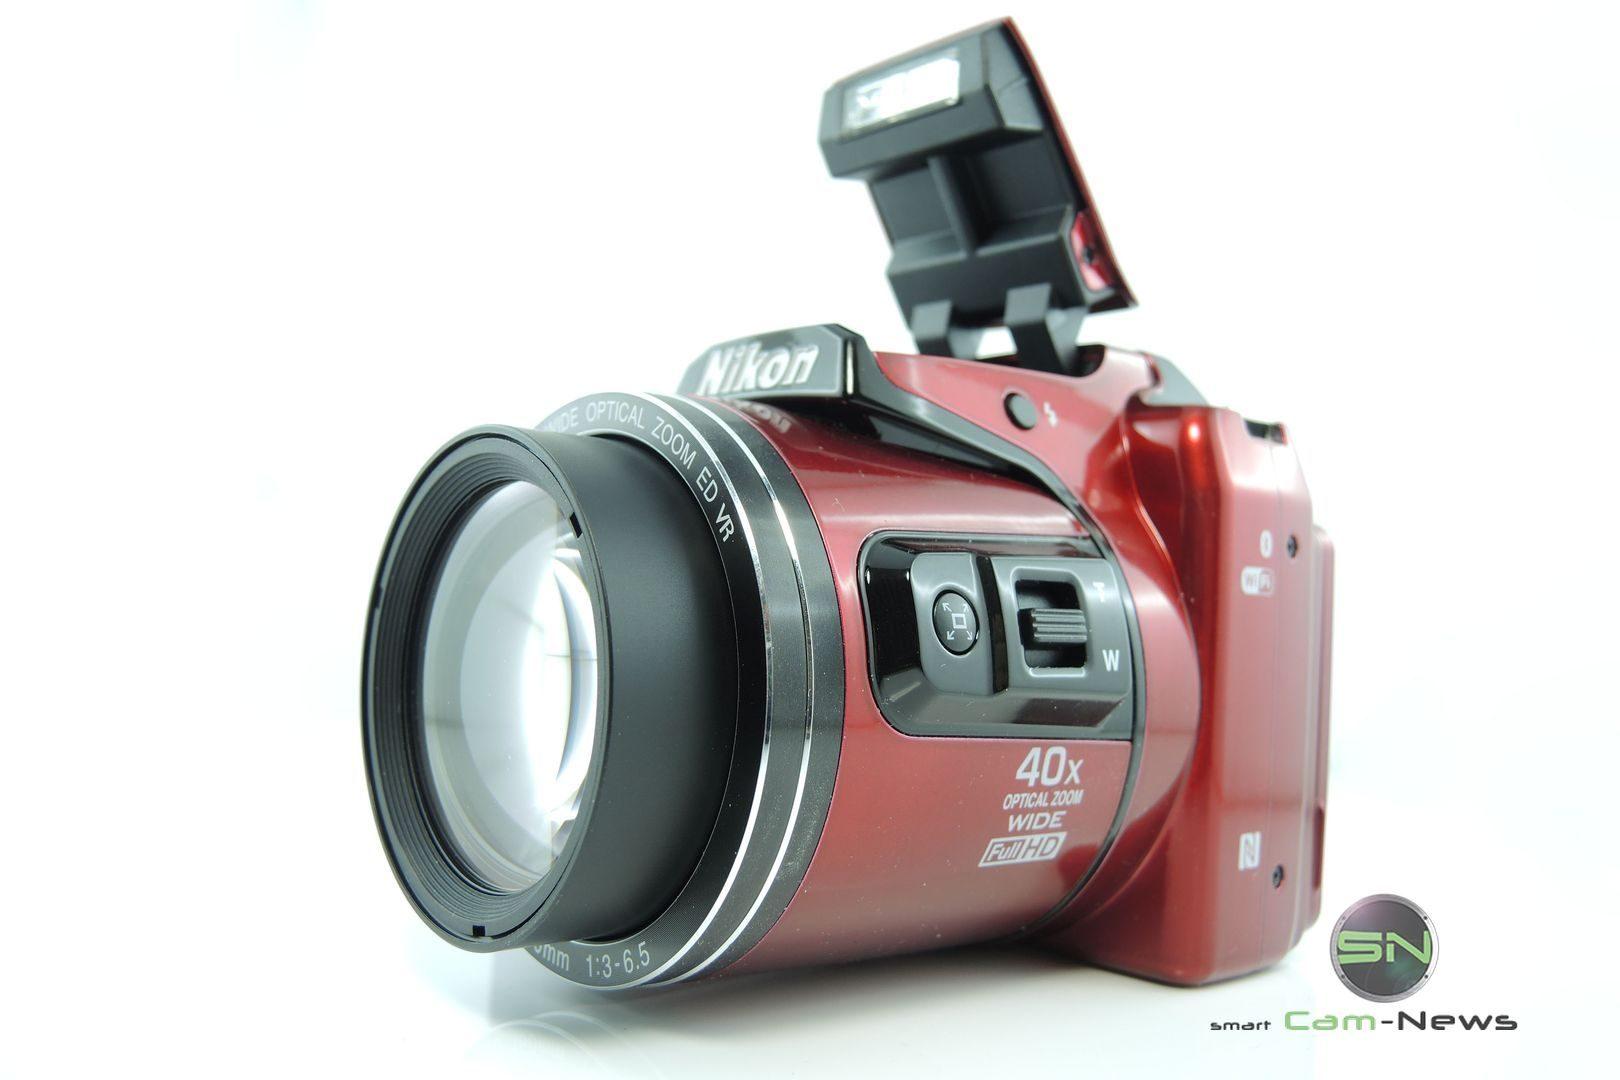 22,5mm-weitwinkel-nikon-b500-smartcamnews